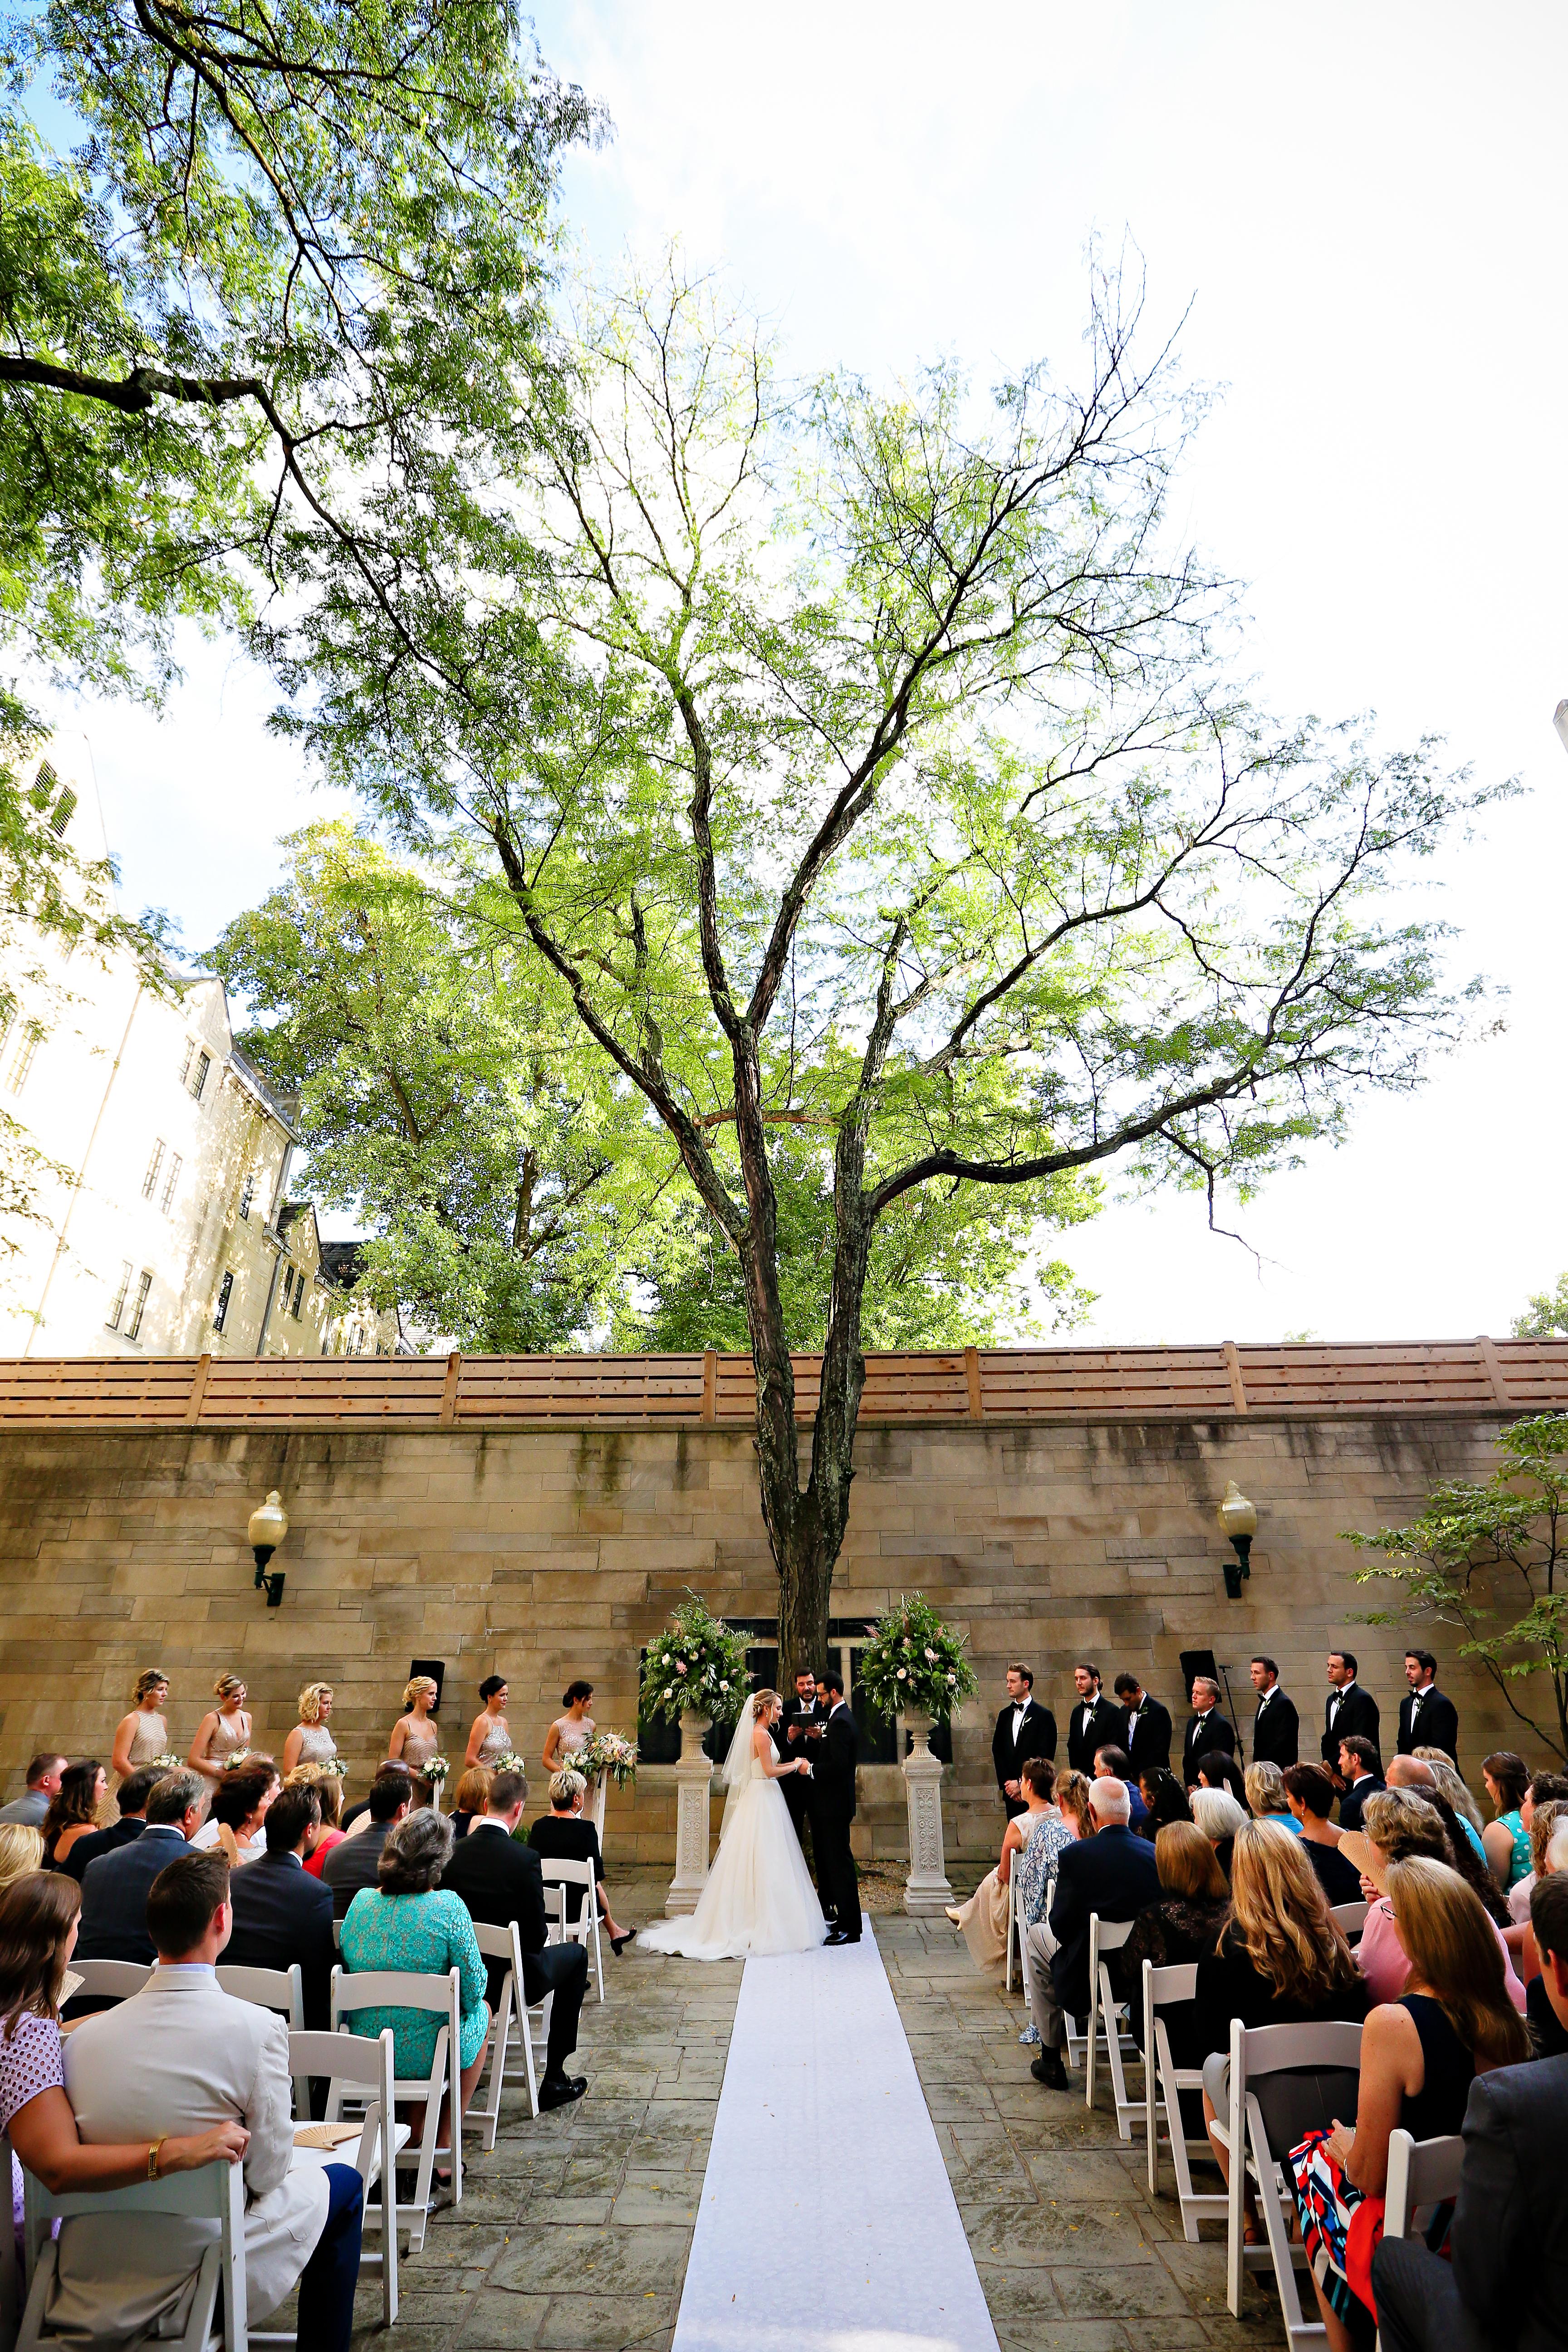 220 meaghan matt indiana university wedding